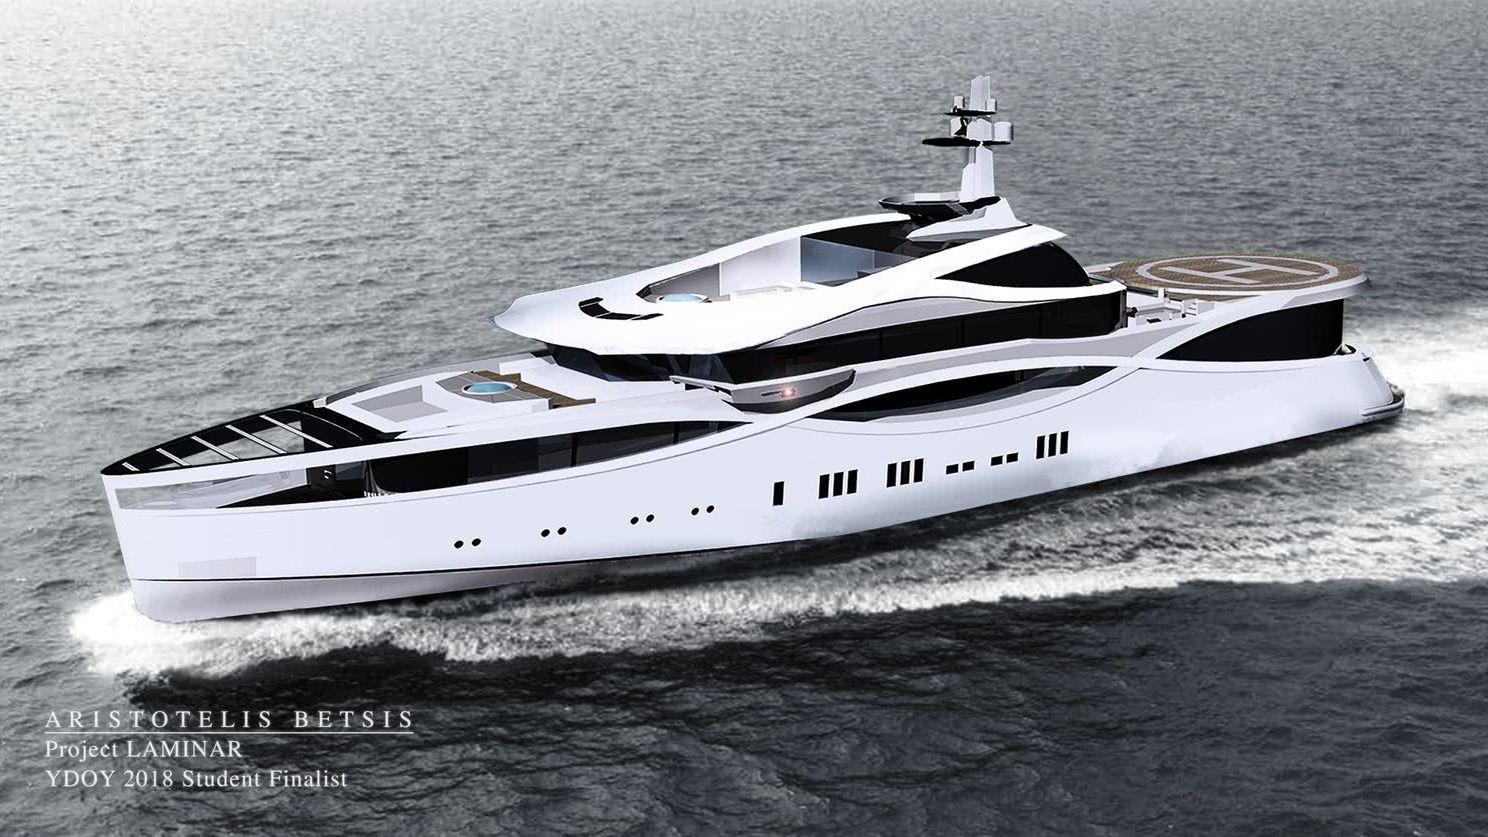 Laminar Yacht Aristotelis Betsis